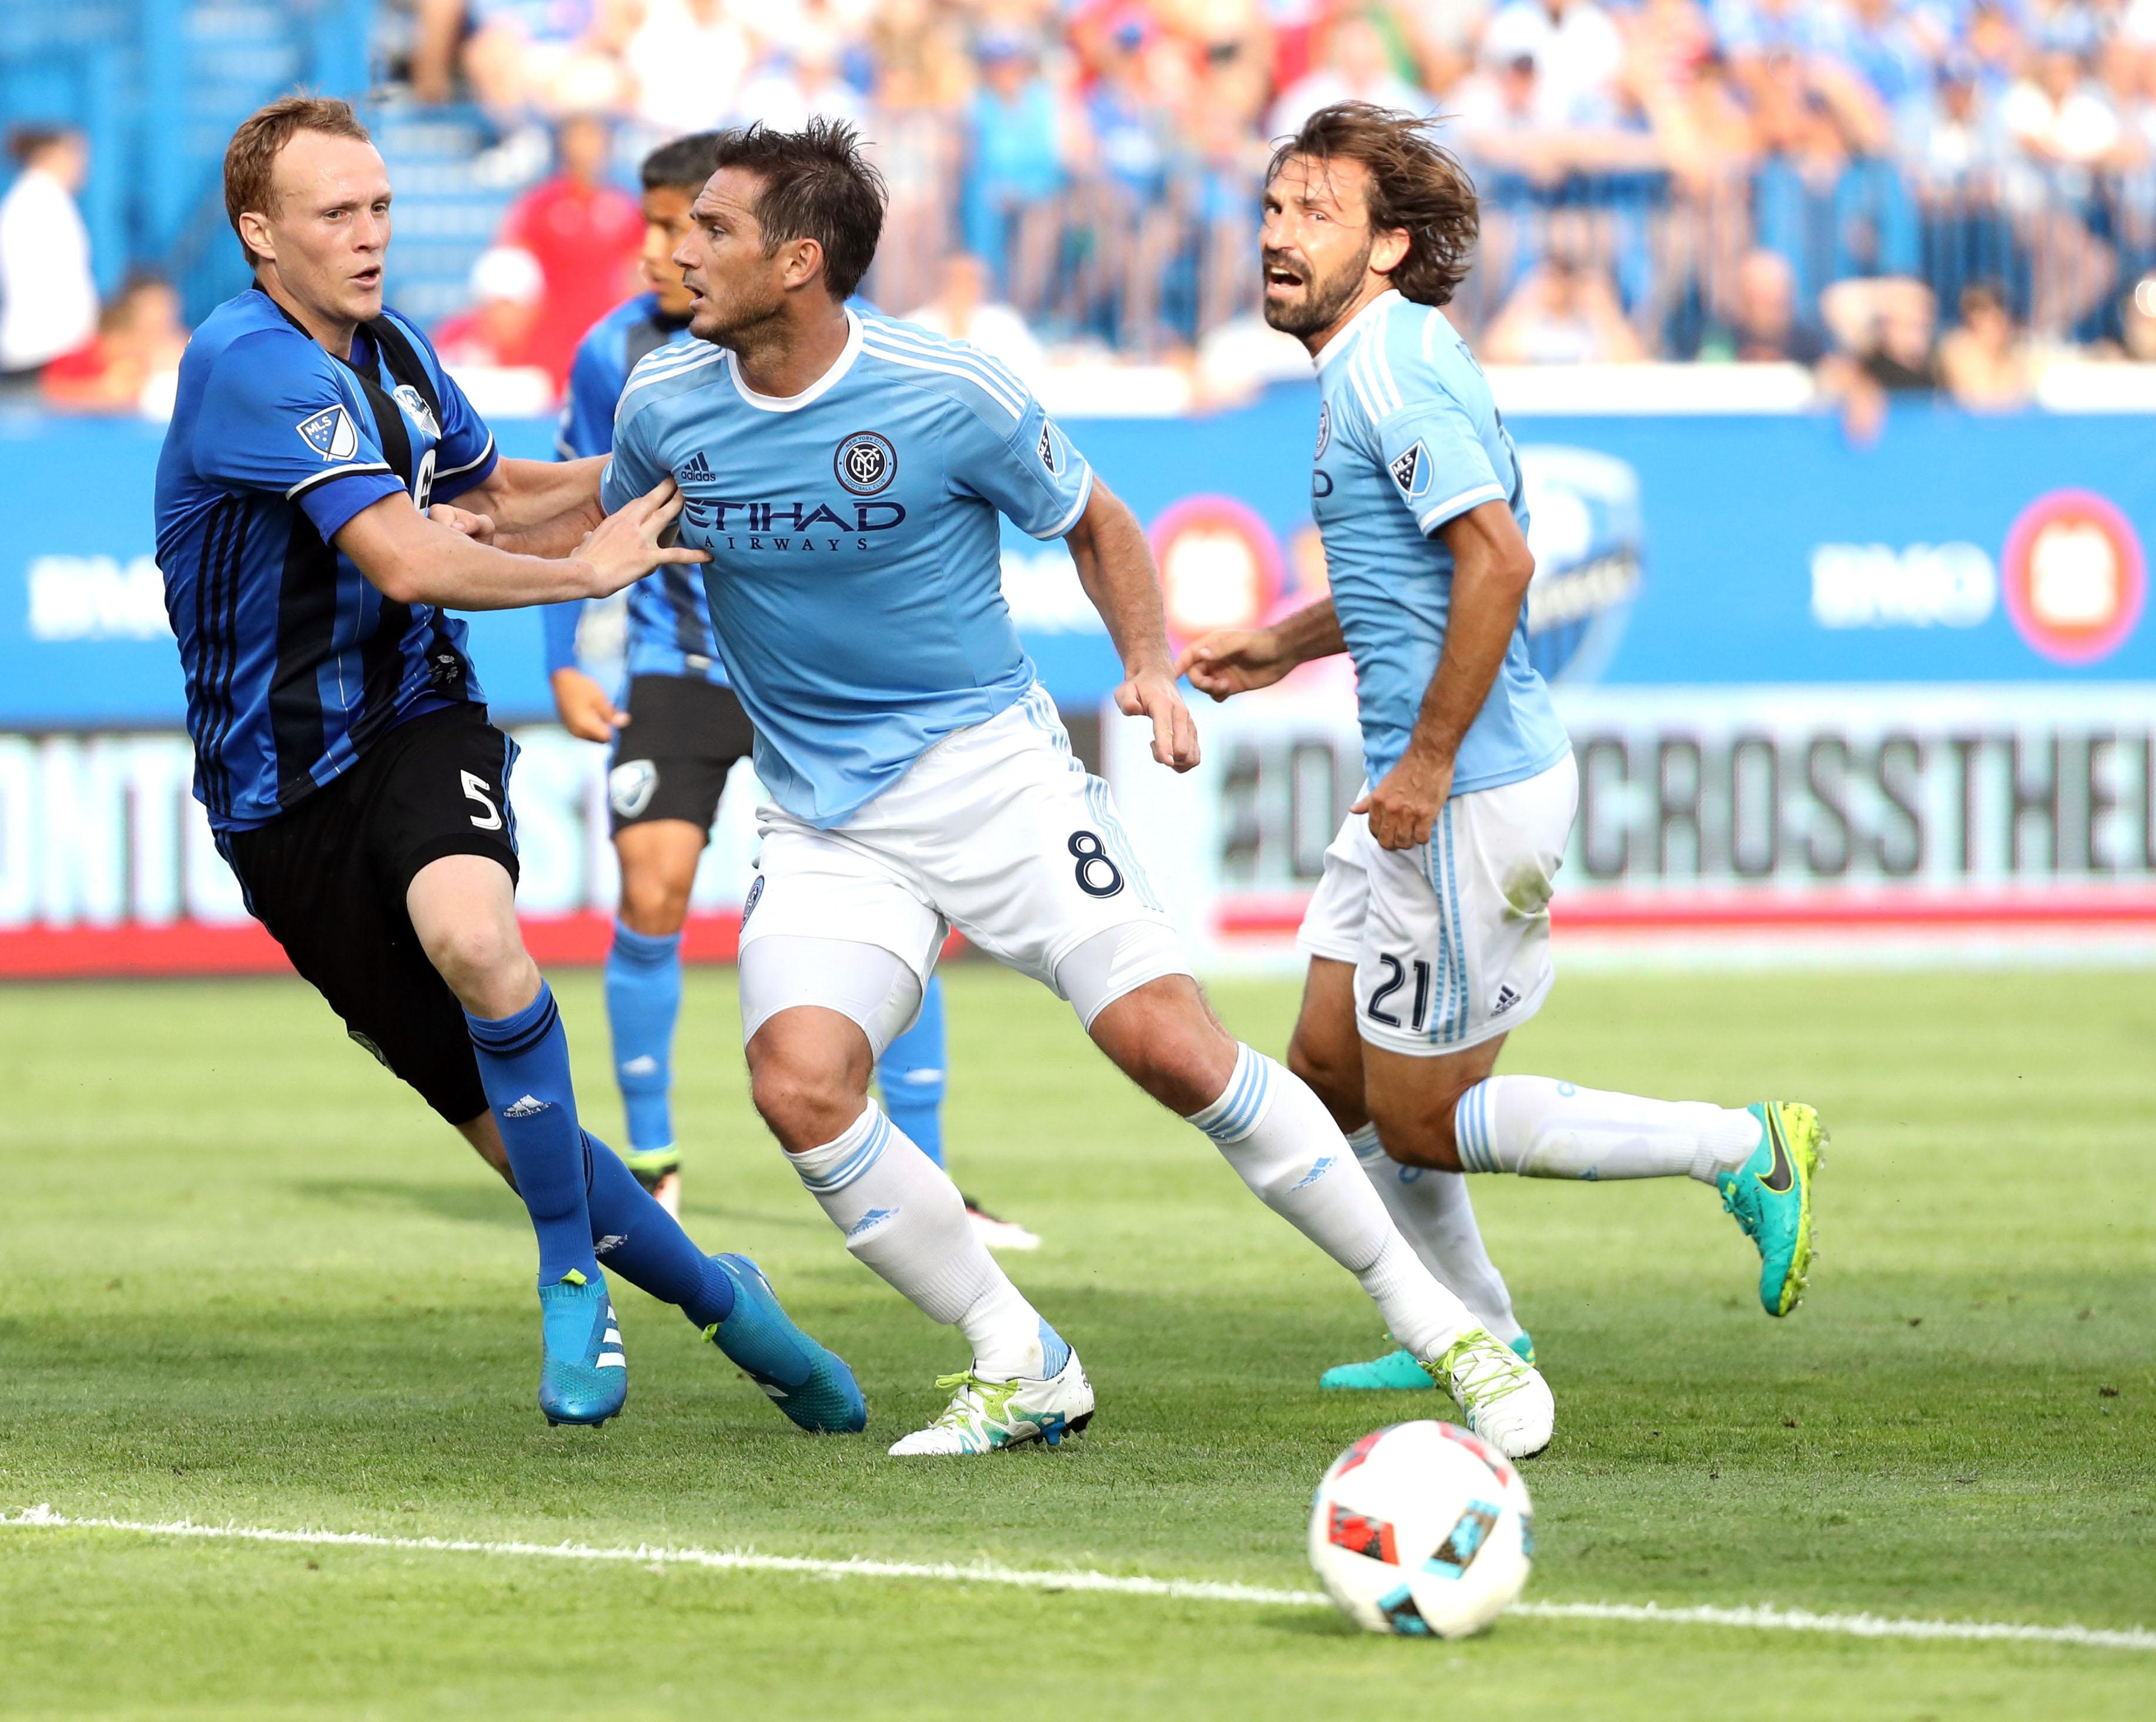 MLS: New York City FC at Montreal Impact